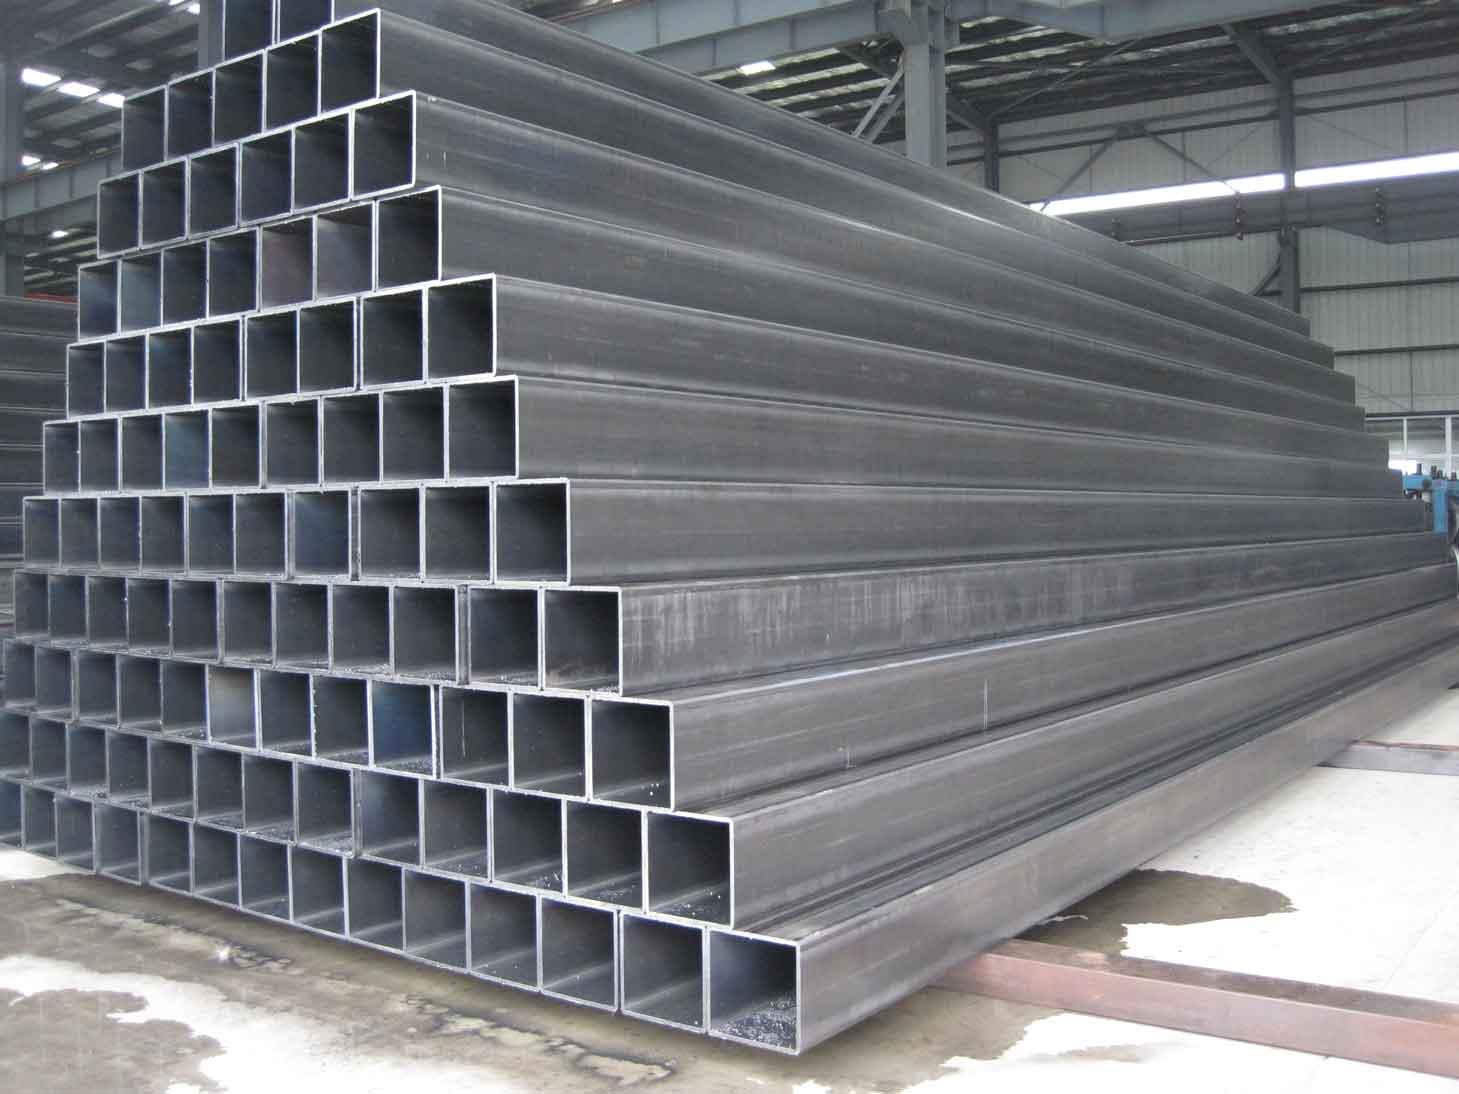 Black astm a500 grade b steel pipe in china dongpengboda